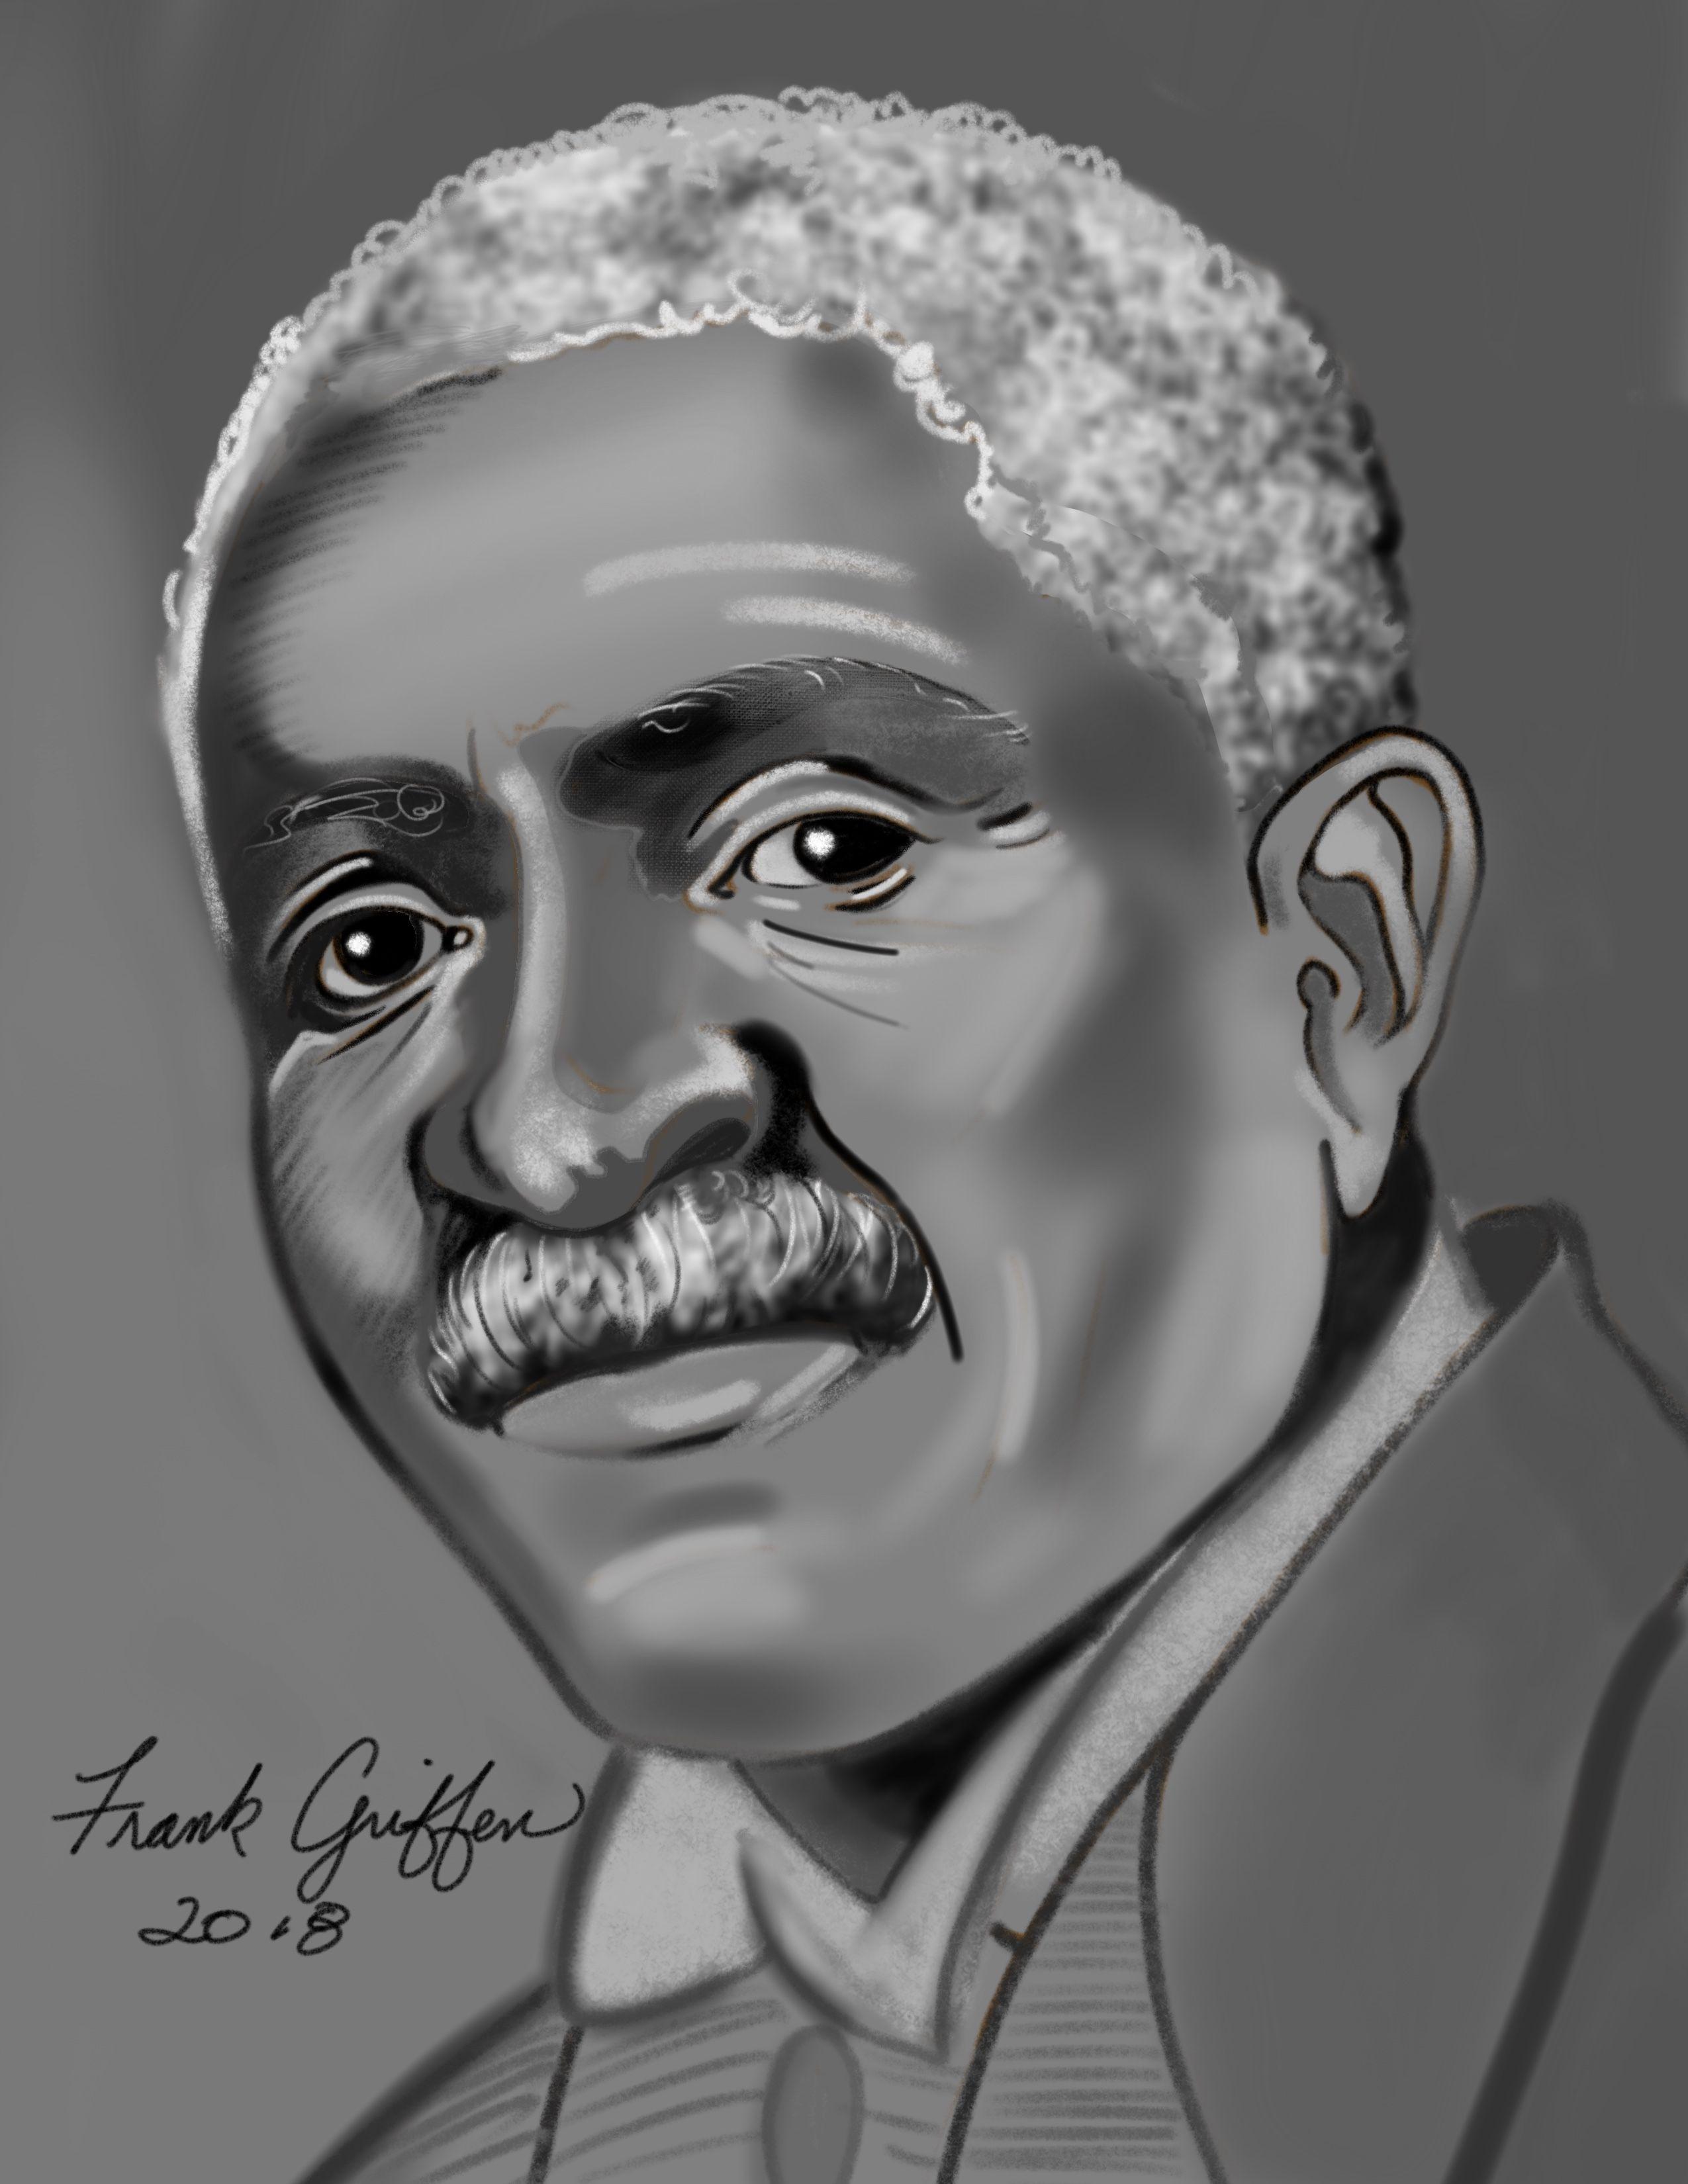 George Washington Carver Drawing To Accompany The